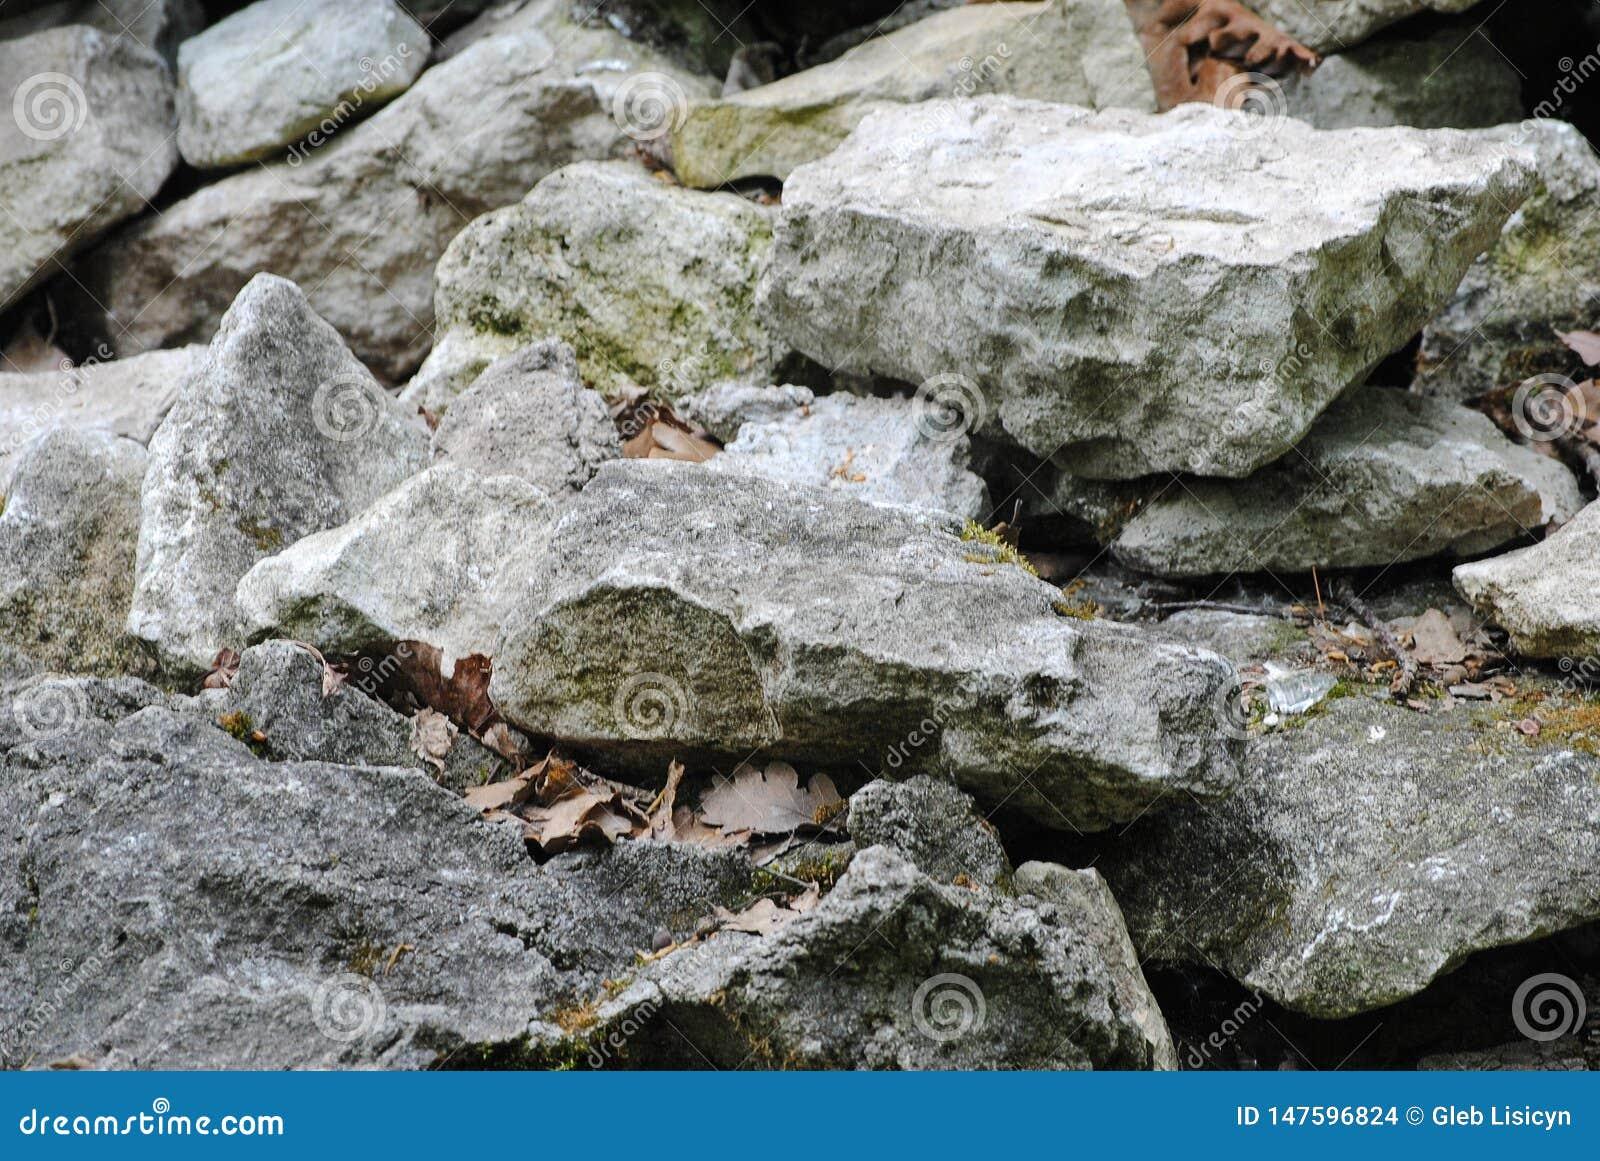 Stones closeup. stone texture.